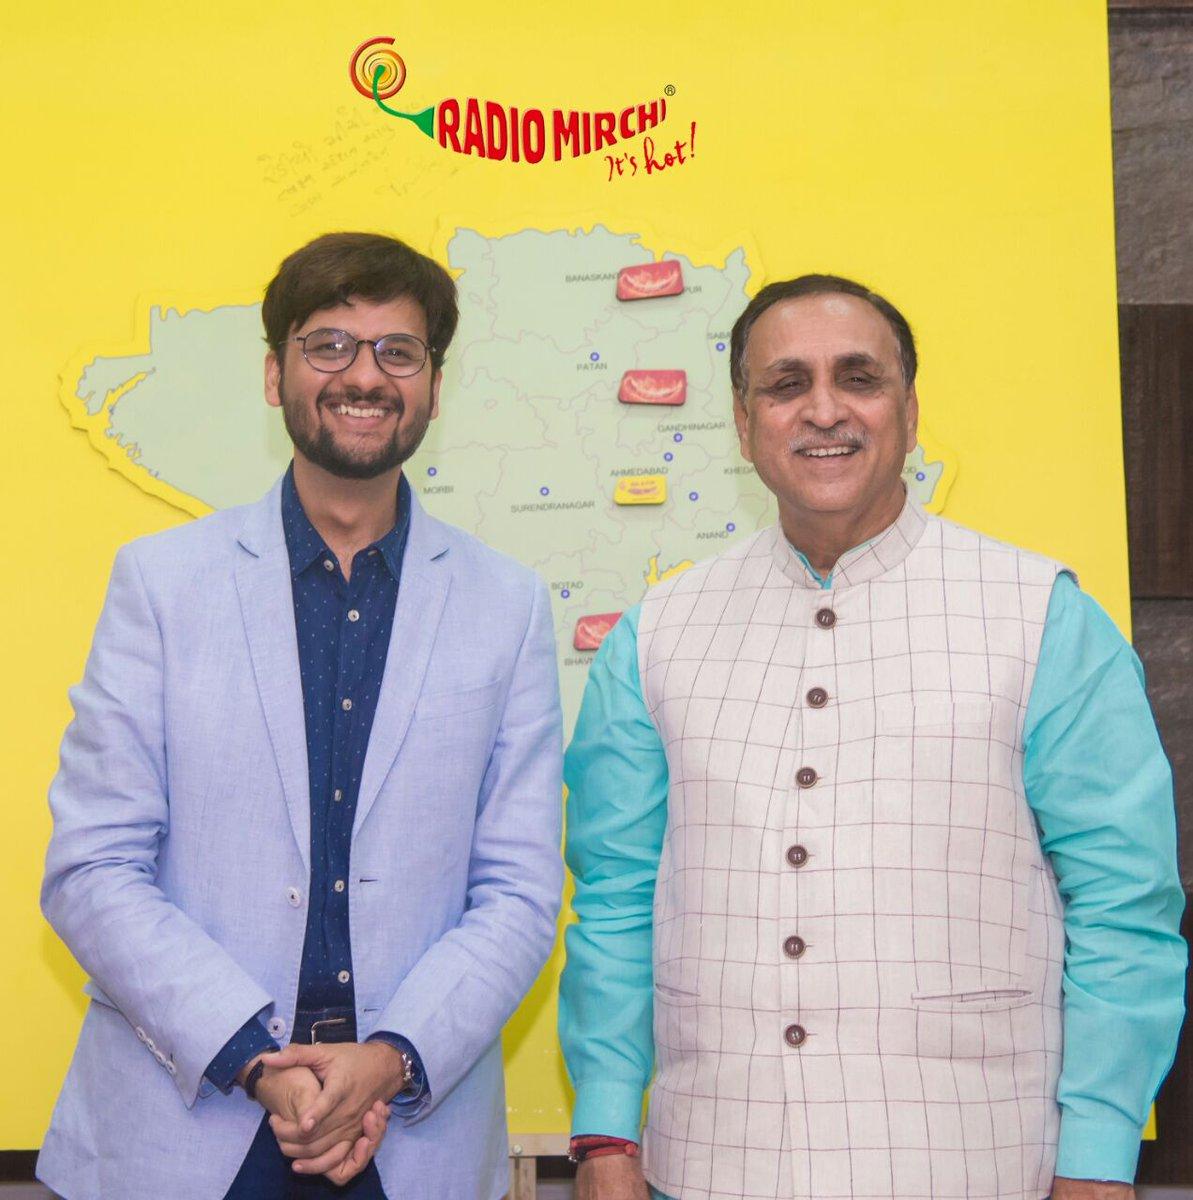 Honorable CM @vijayrupanibjp launching the new mirchi stations of Gujarat! @RadioMirchi #mirchi923bharuch #bharuchkhushhua #mirchi #radio #radiomirchi #bharuch #gujarat #cm #chiefMinister #VijayRupani https://t.co/BZOPJ4H9EL